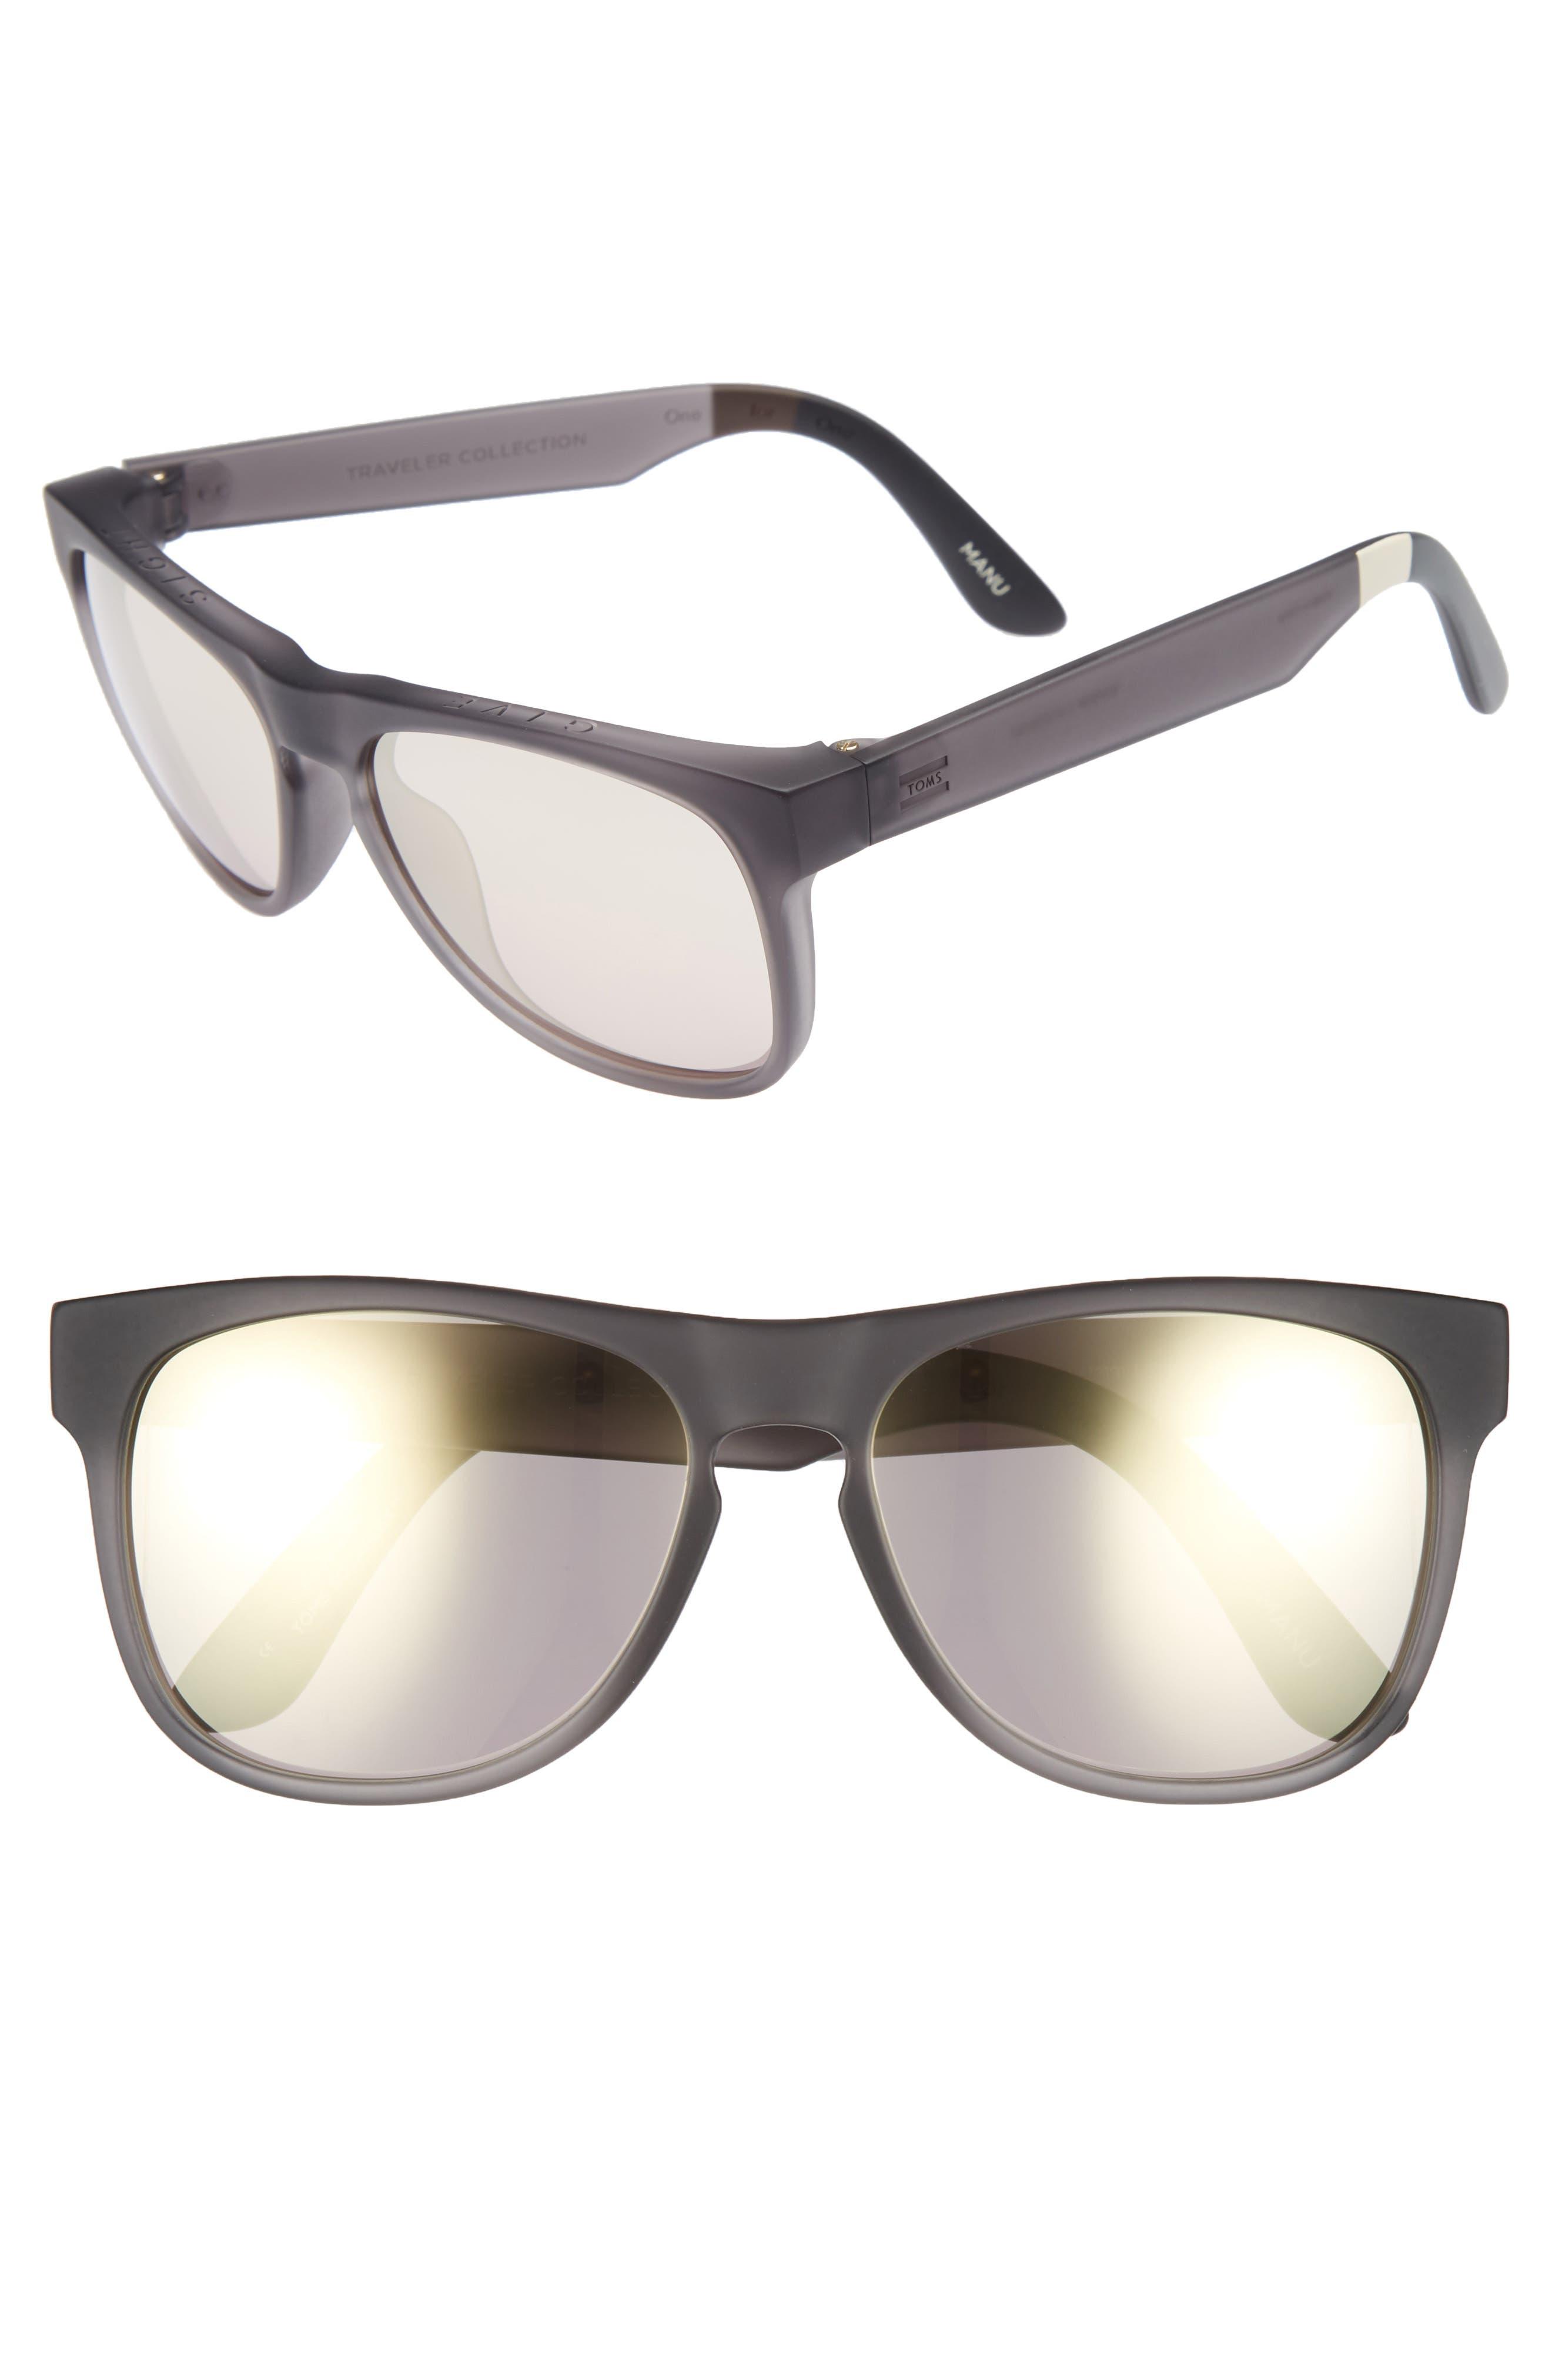 Manu 57mm Sunglasses,                             Main thumbnail 1, color,                             PEWTER